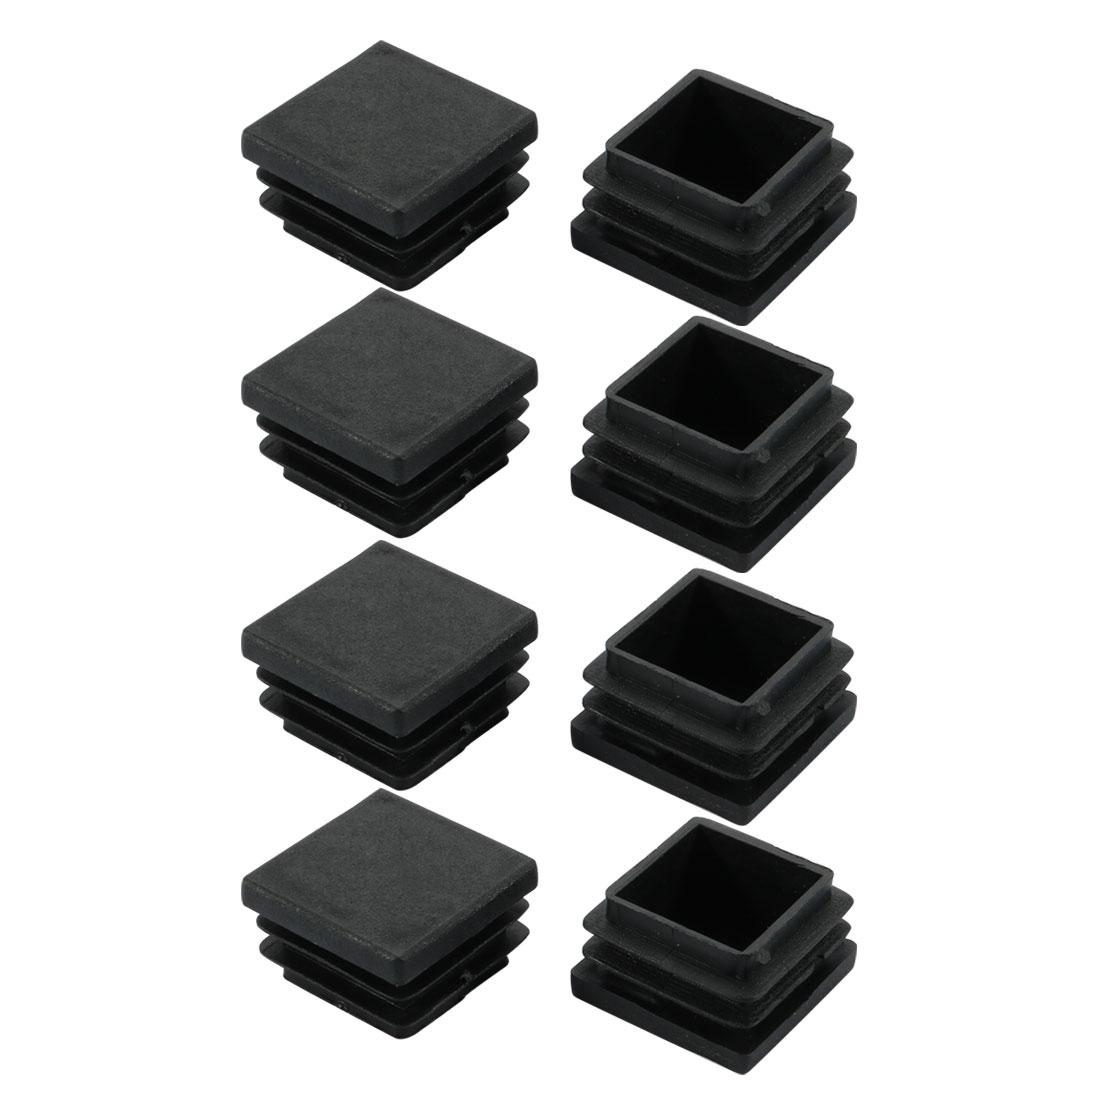 8pcs 26x26mm Black Plastic Square Cabinet Leg Insert Cover Protector